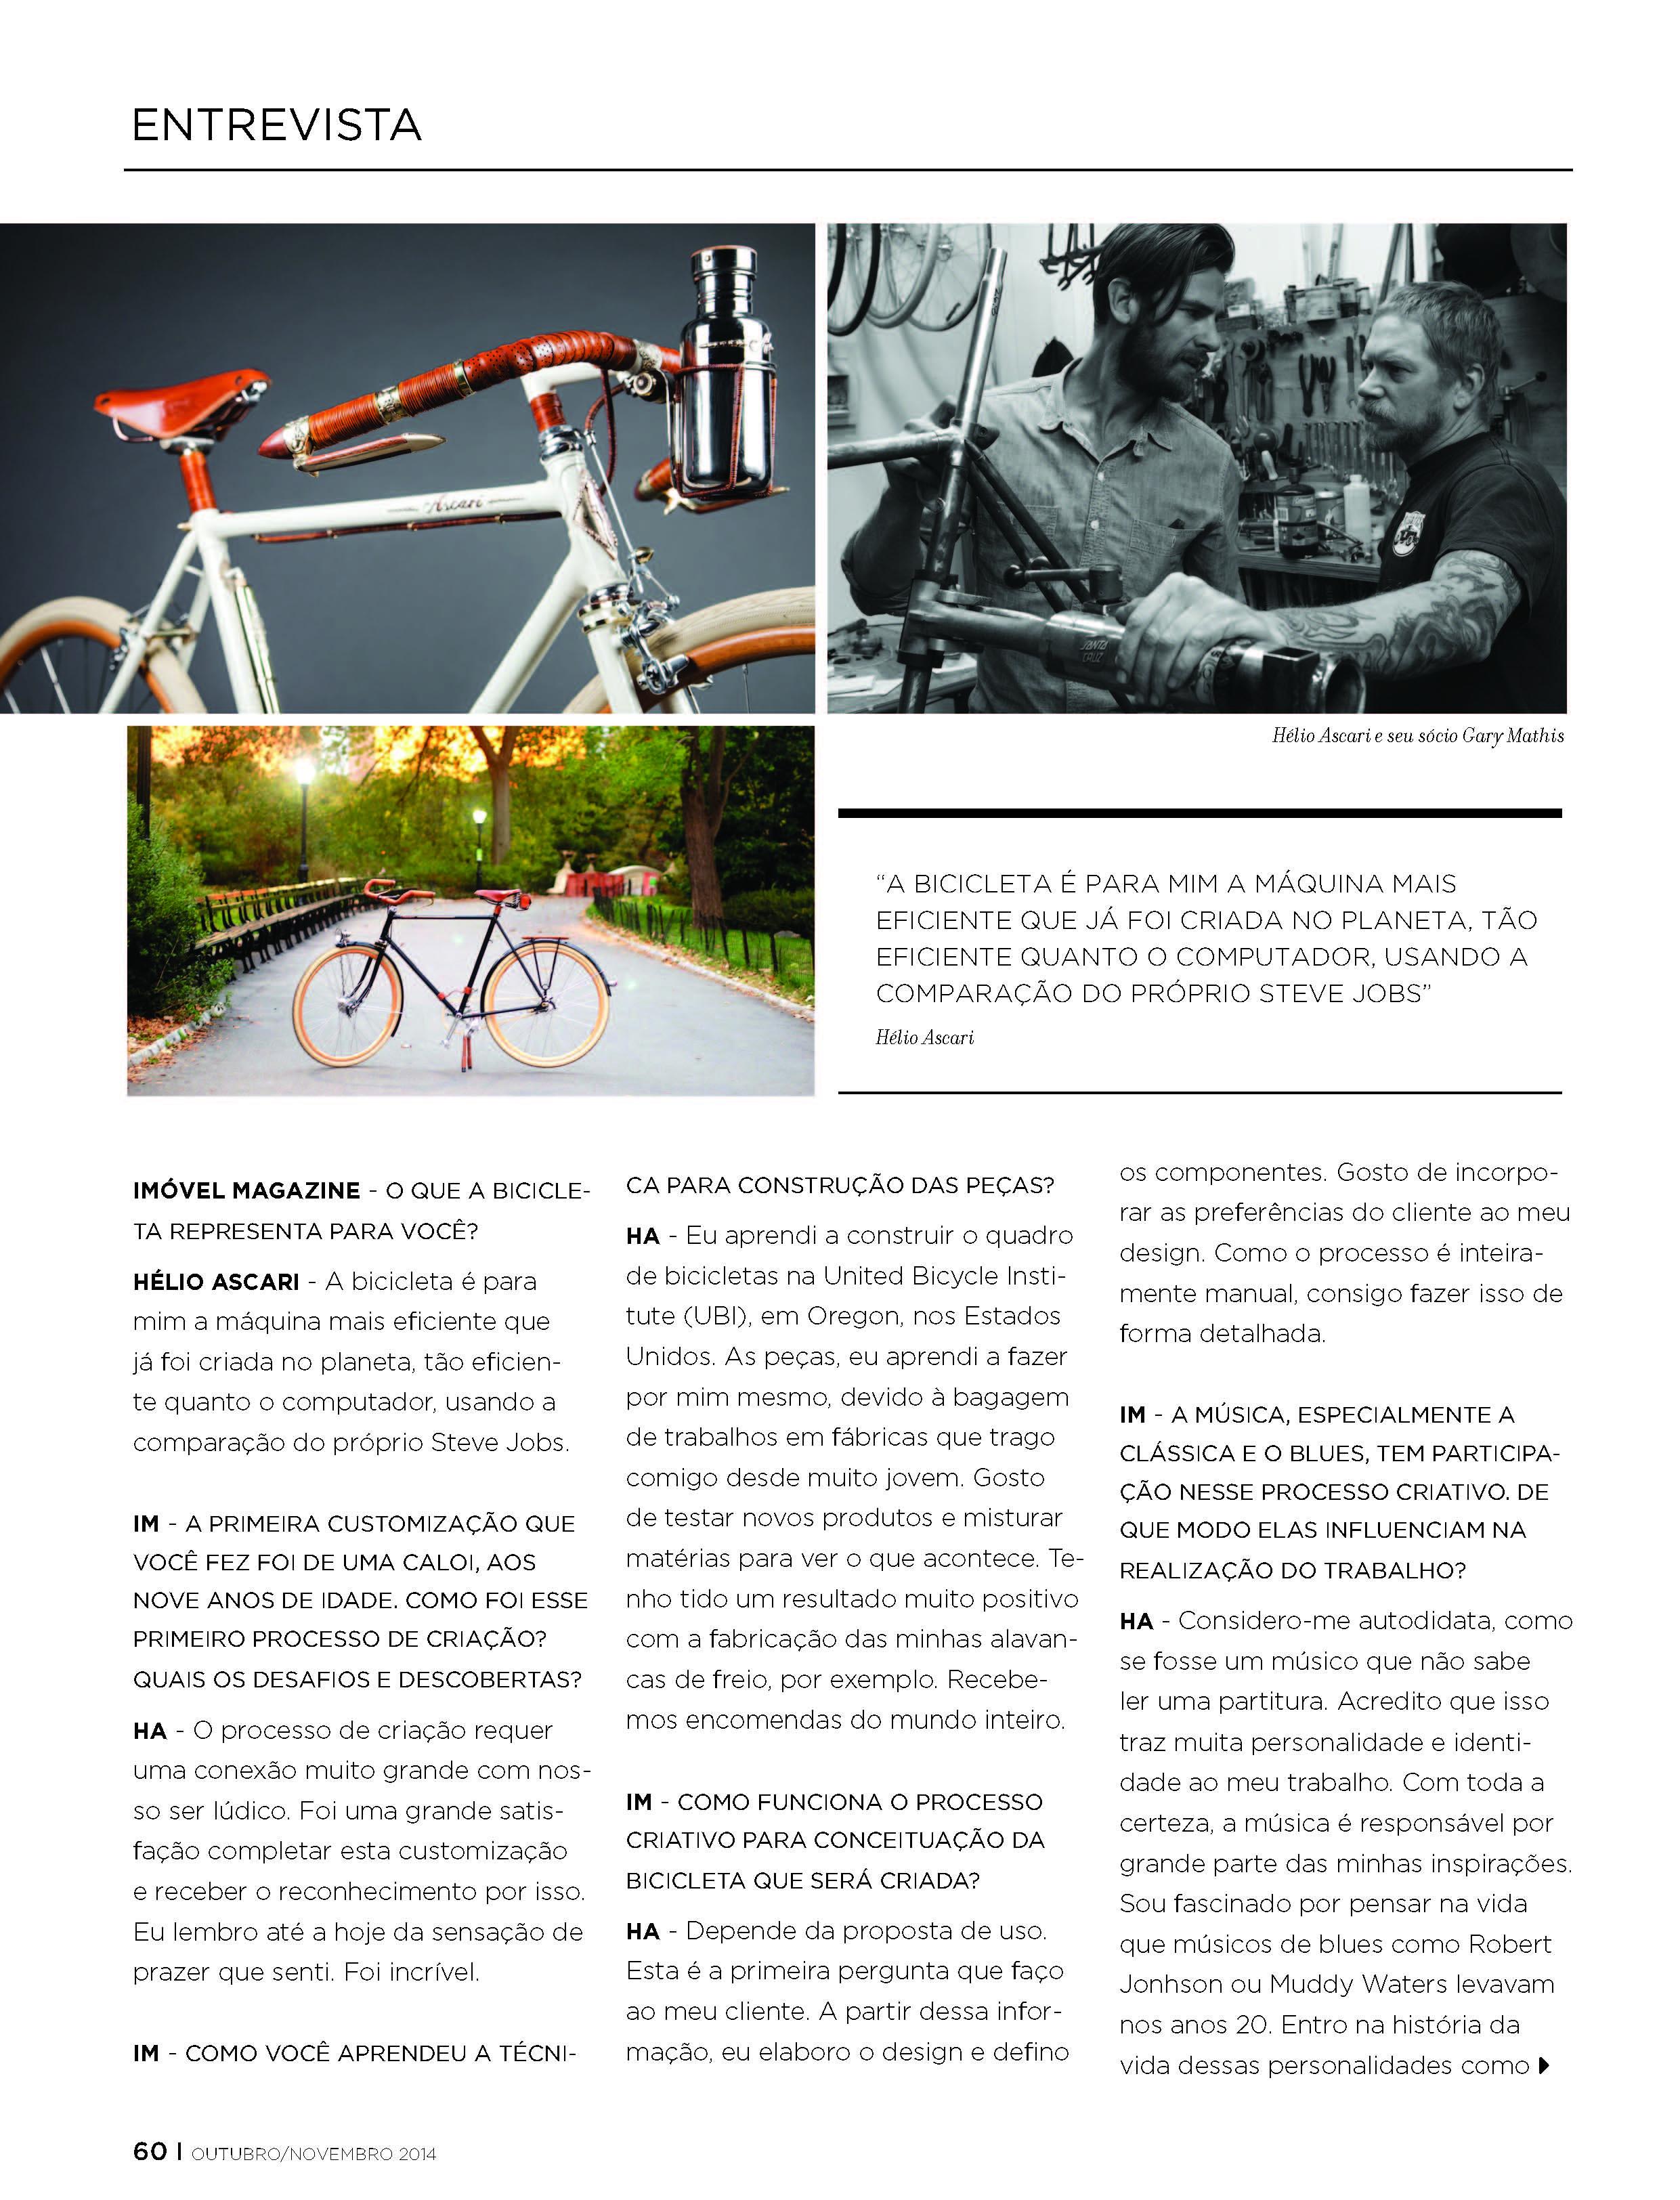 Imovel Magazine_Page_2.jpg